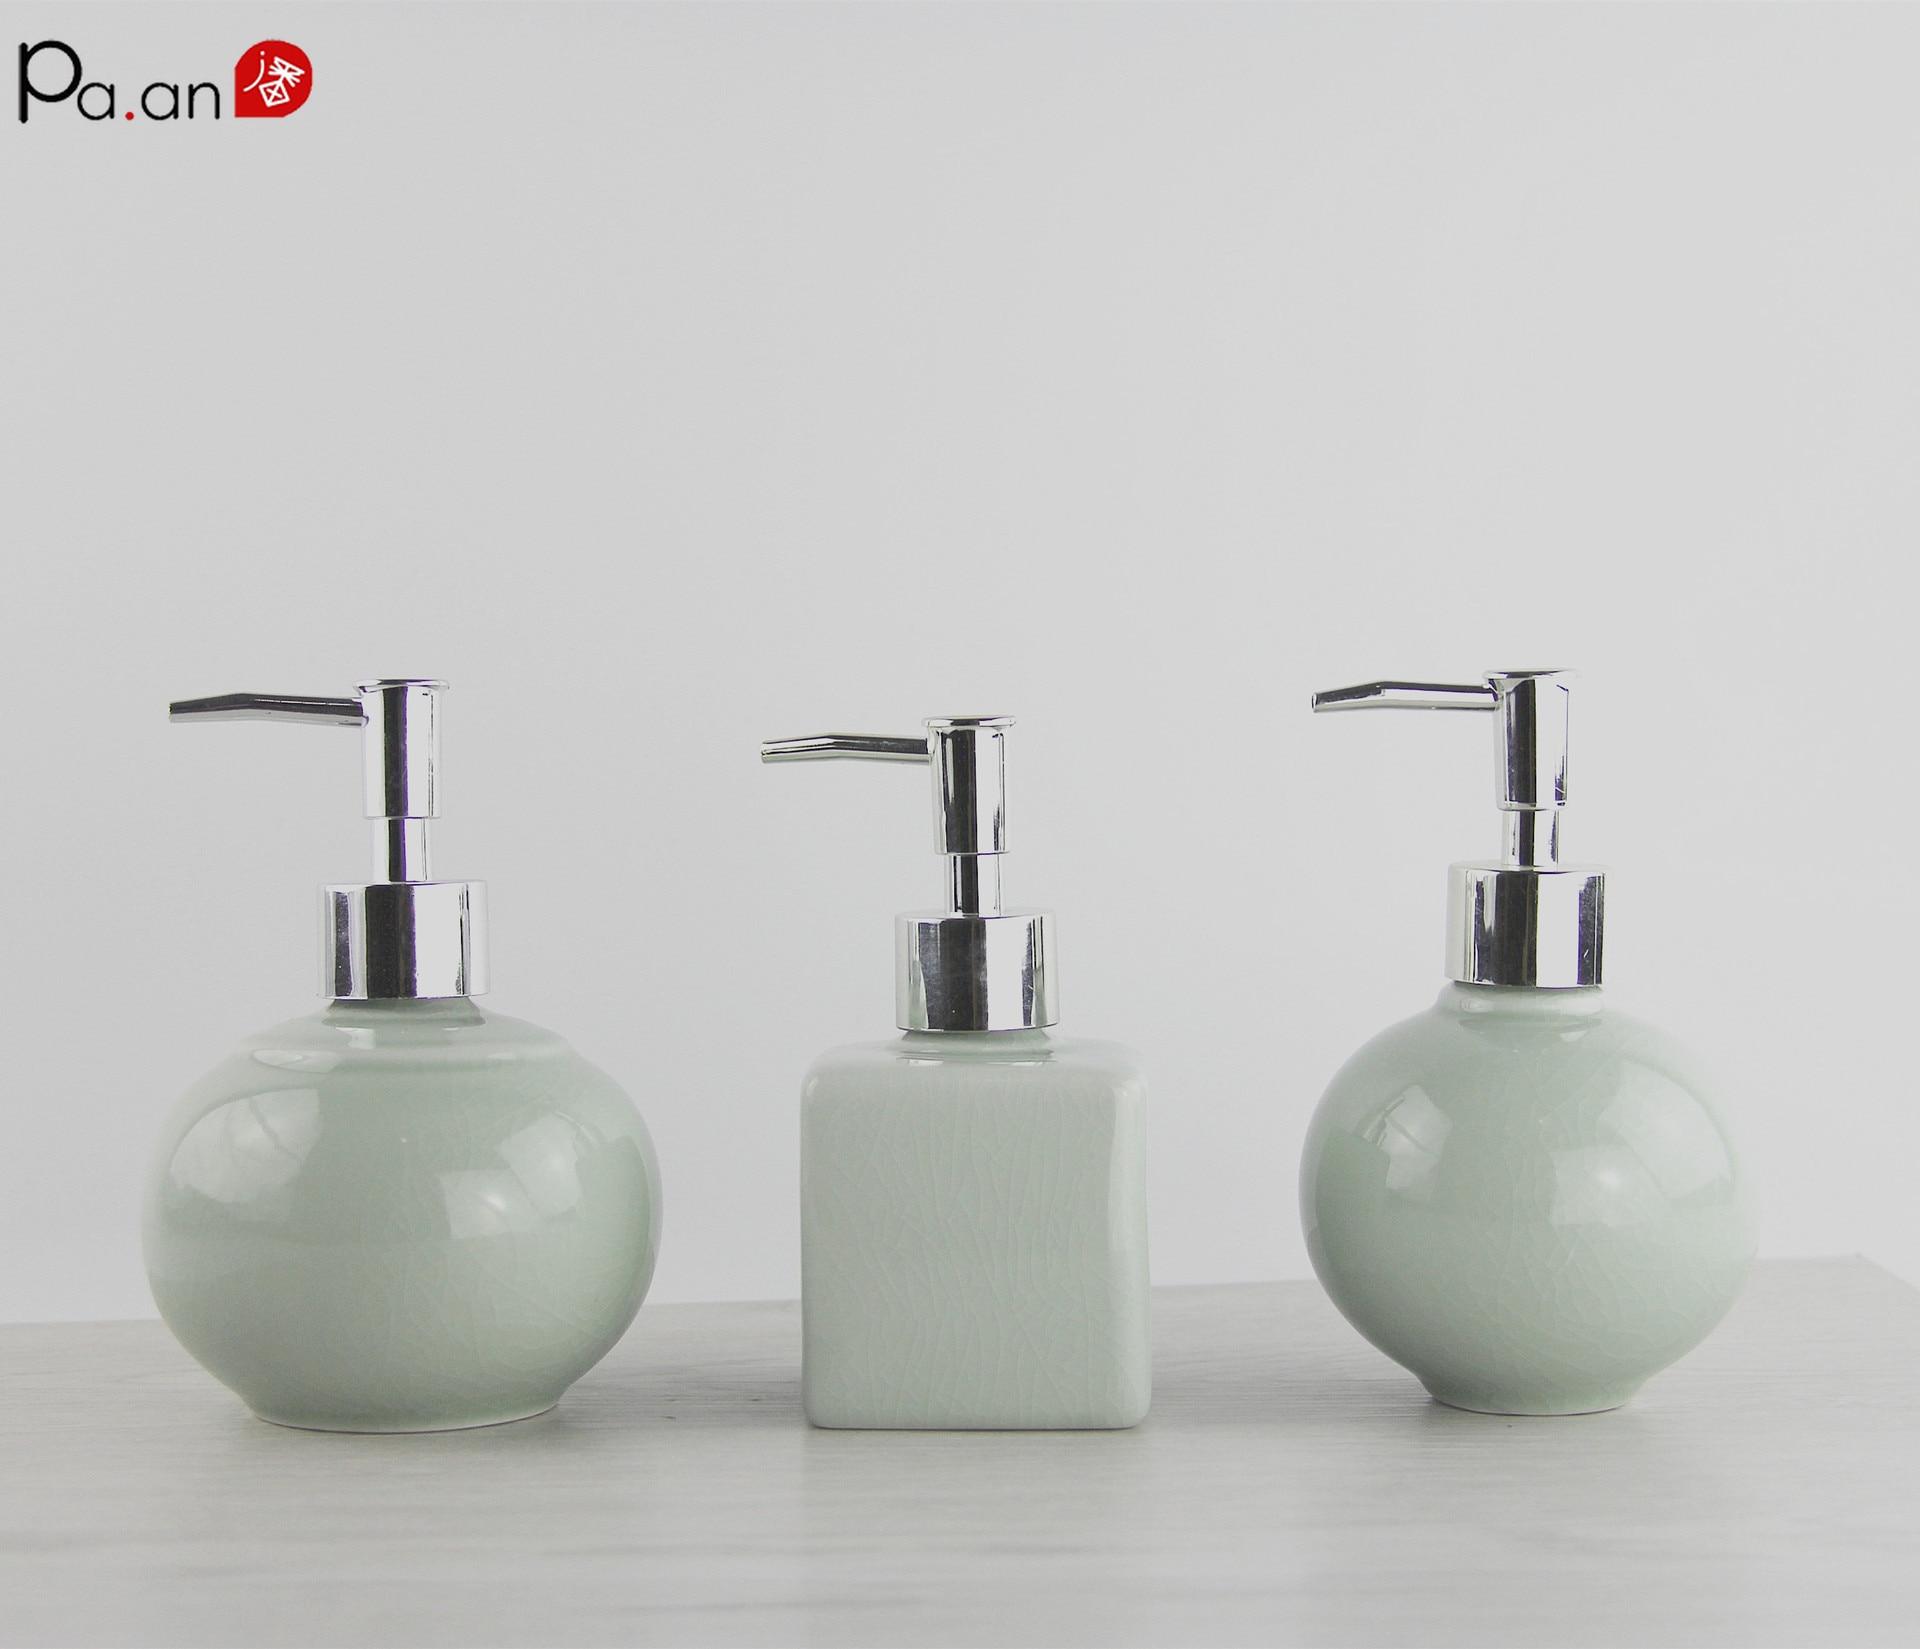 US $5.57 40% OFF|Vintage Porcelain Soap Dispenser Kitchen Sink Bathroom  Vanity Countertop Retro Liquid Cream Pump Bottle Ice Crack Best Gift-in  Liquid ...